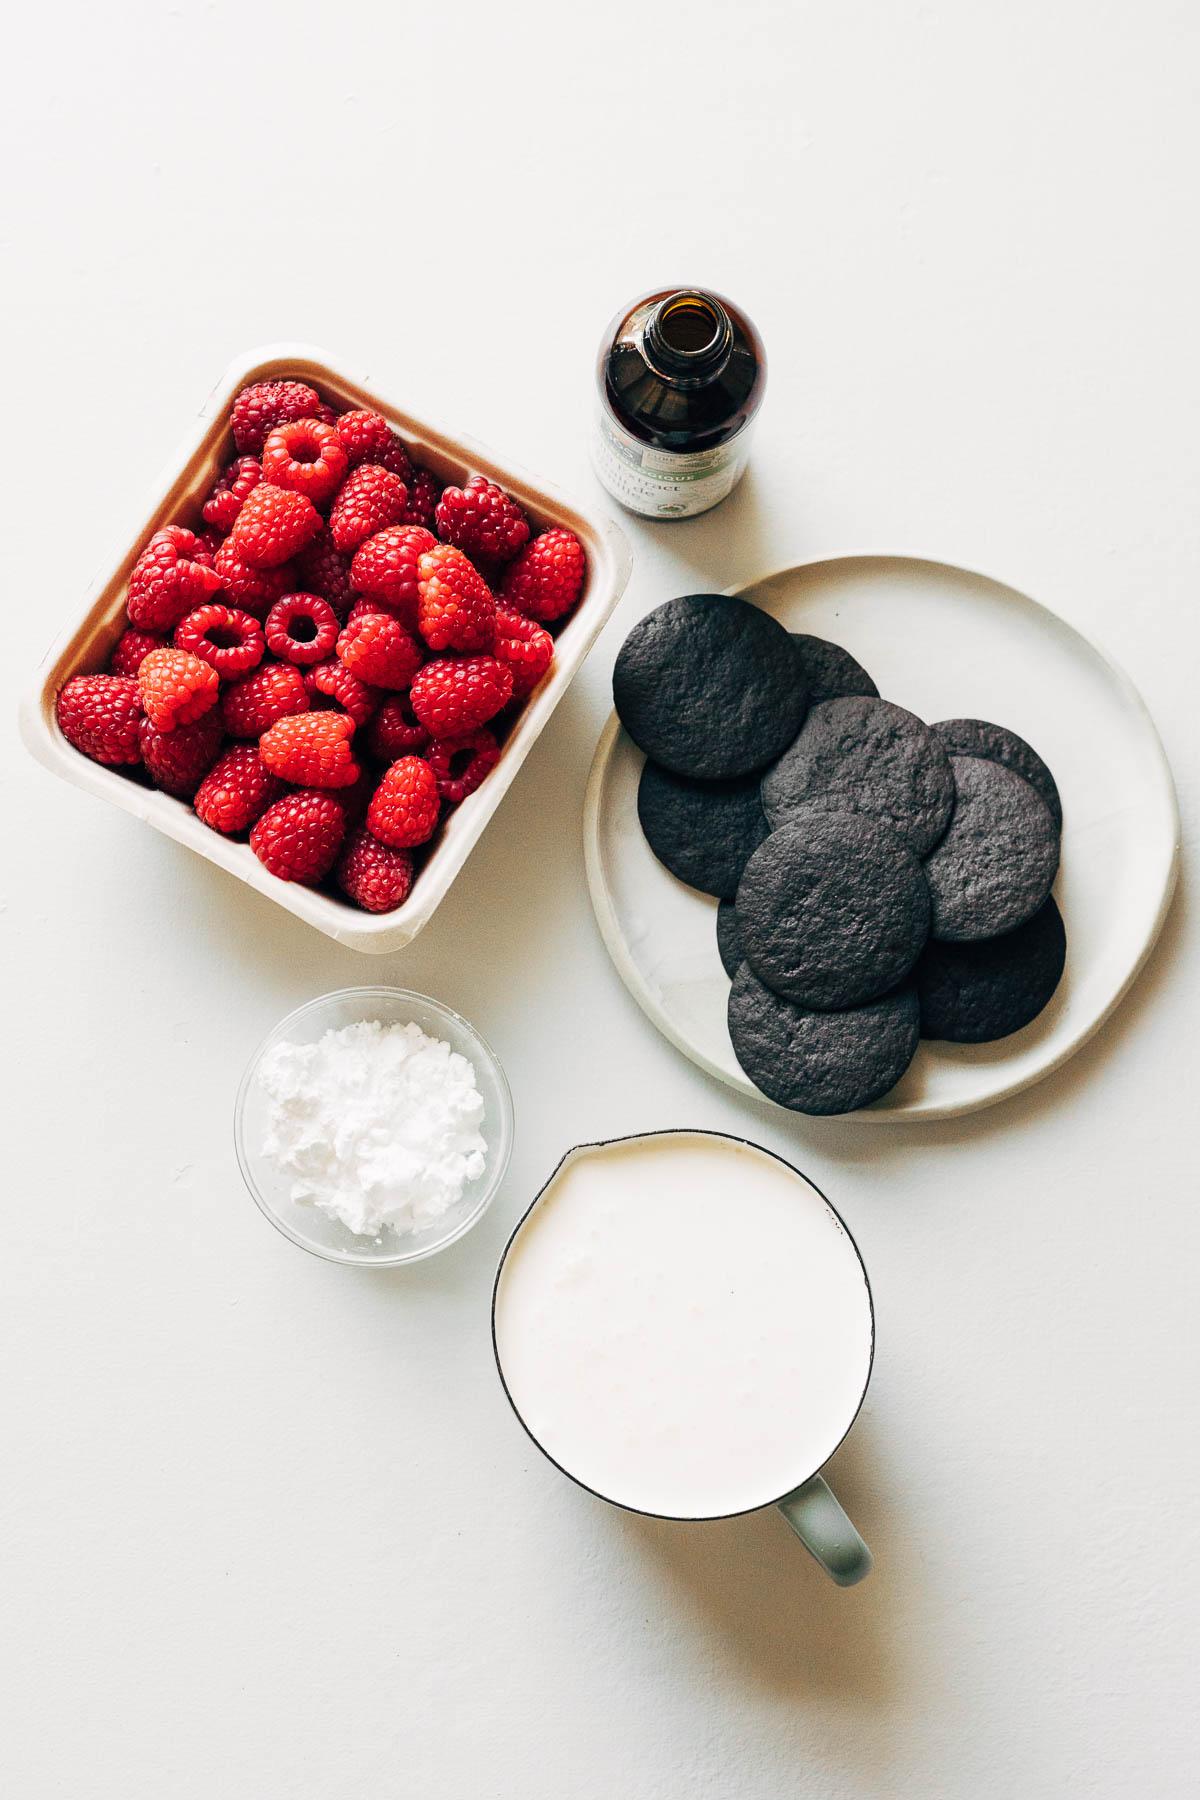 Icebox cake ingredients: fresh raspberries, chocolate wafer cookies, vanilla, cream, and icing sugar.